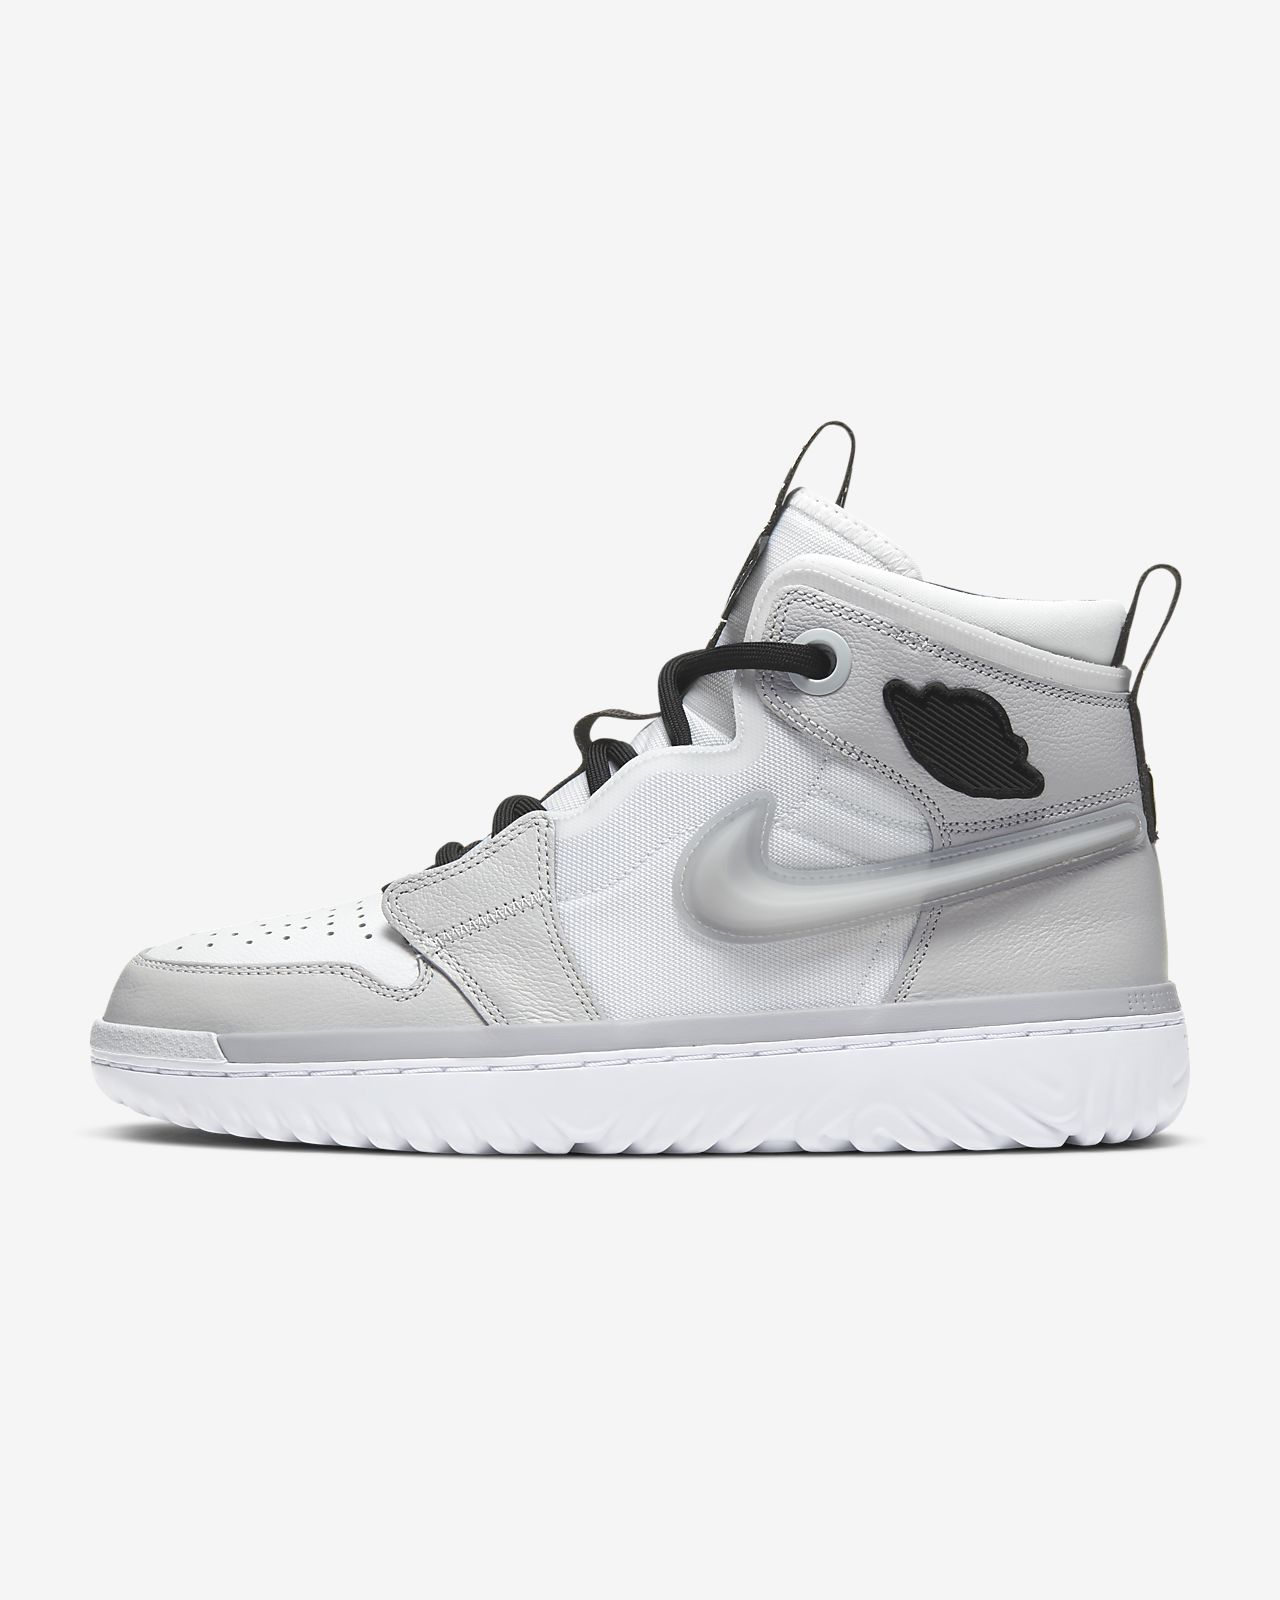 best sneakers buy best new high quality Air Jordan 1 High React Shoe